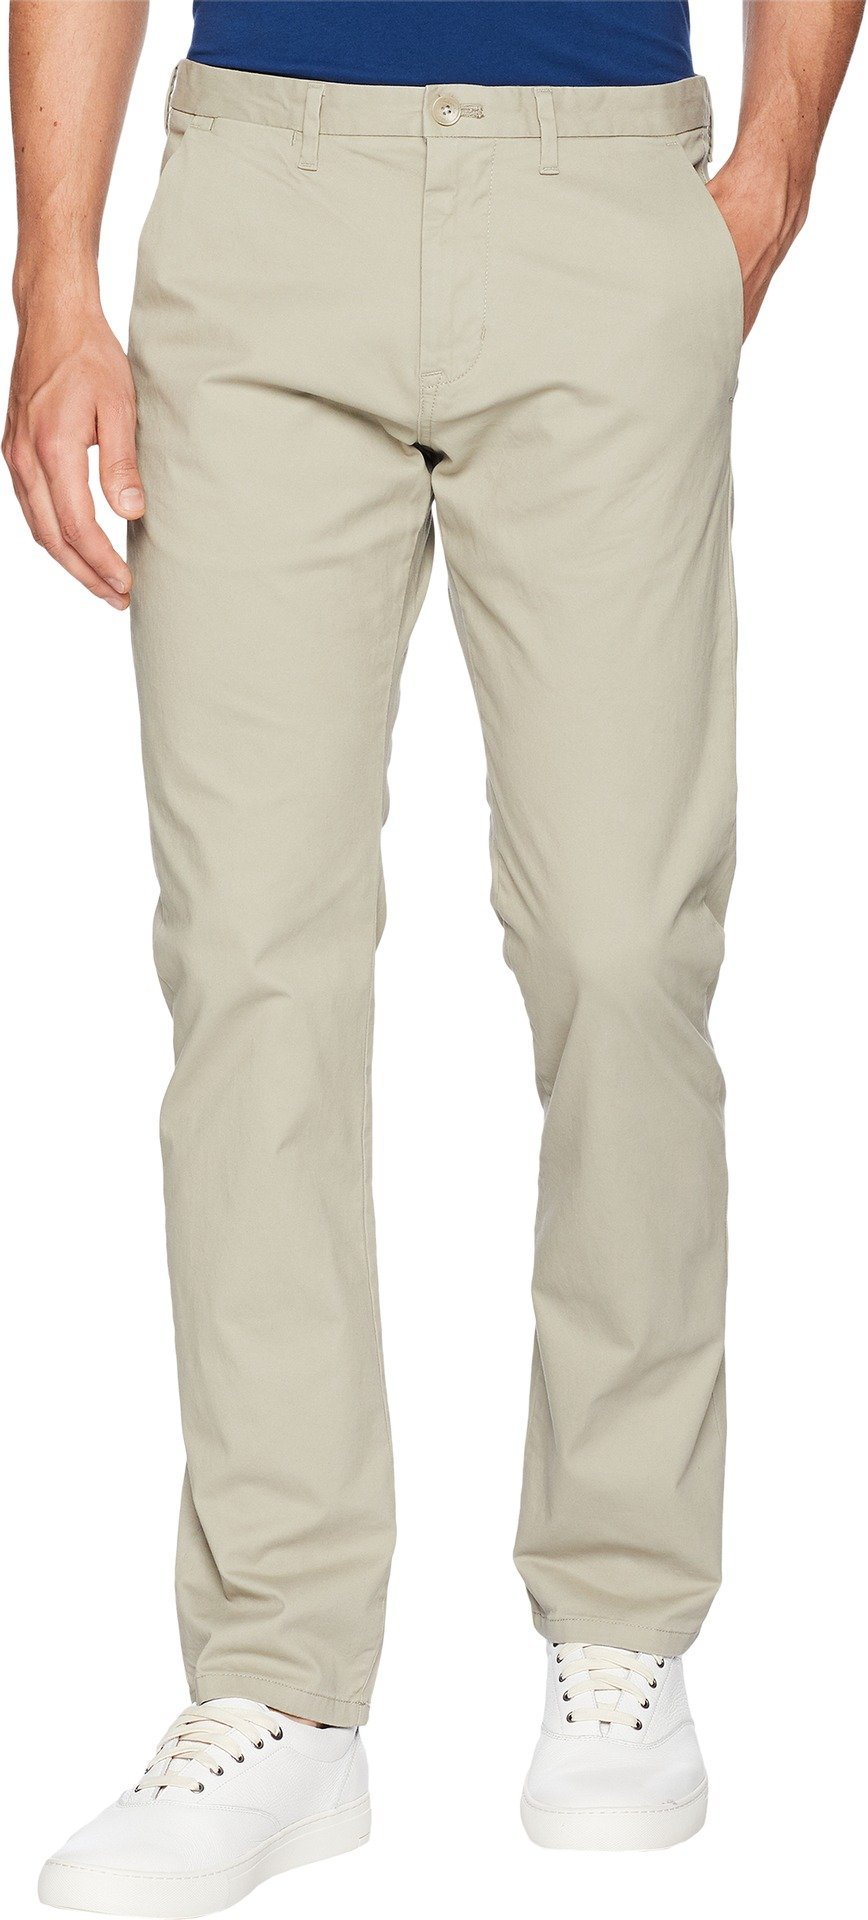 Calvin Klein Men's Dylan Soft Wash Straight Leg Chino Pant, Vintage Taupe, 34W X 32L